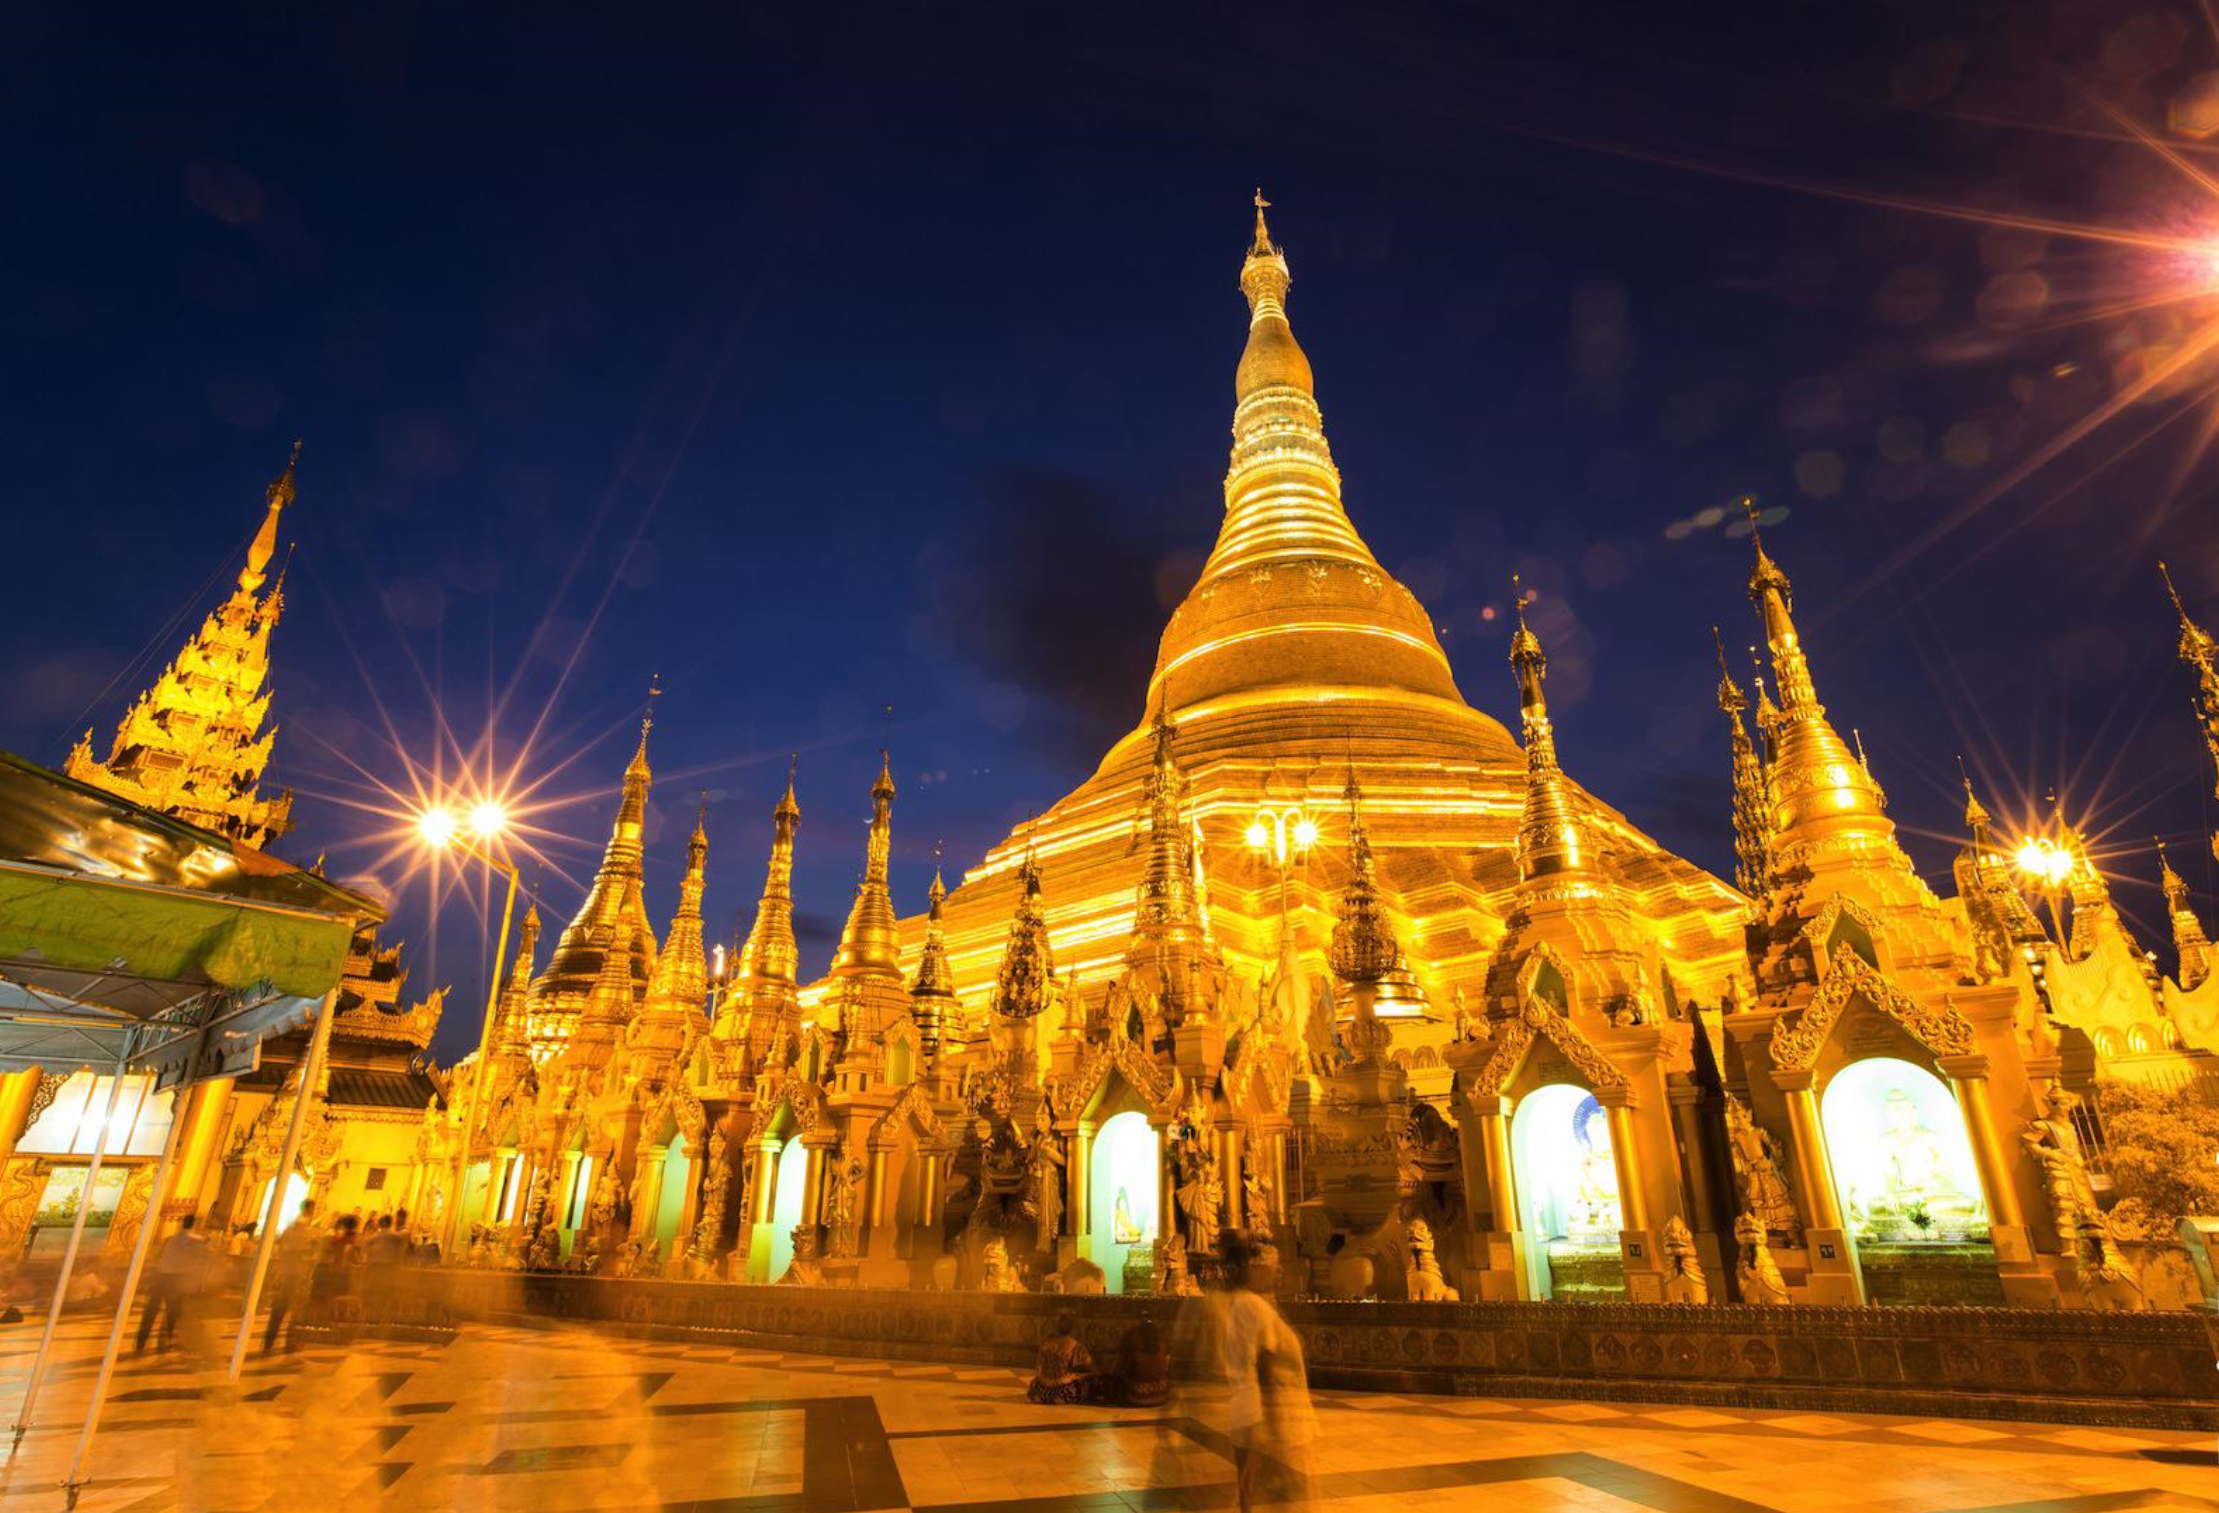 Die goldene Shwedagon Pagode in Yangon, Myanmar, bei Nacht mit Beleuchtung